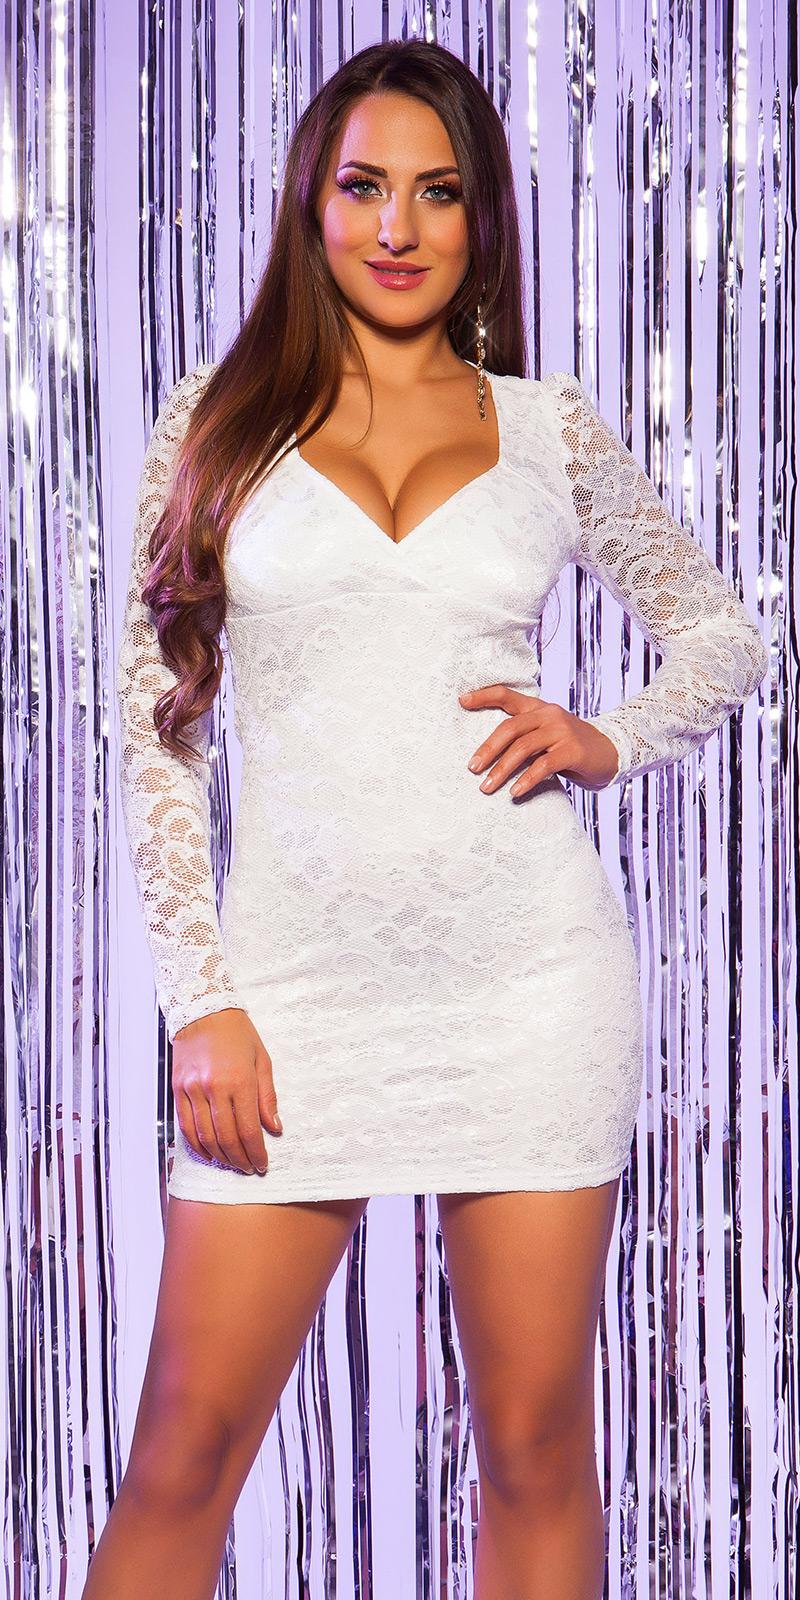 Šaty s dlouhým rukávem 0000C12047 - cream